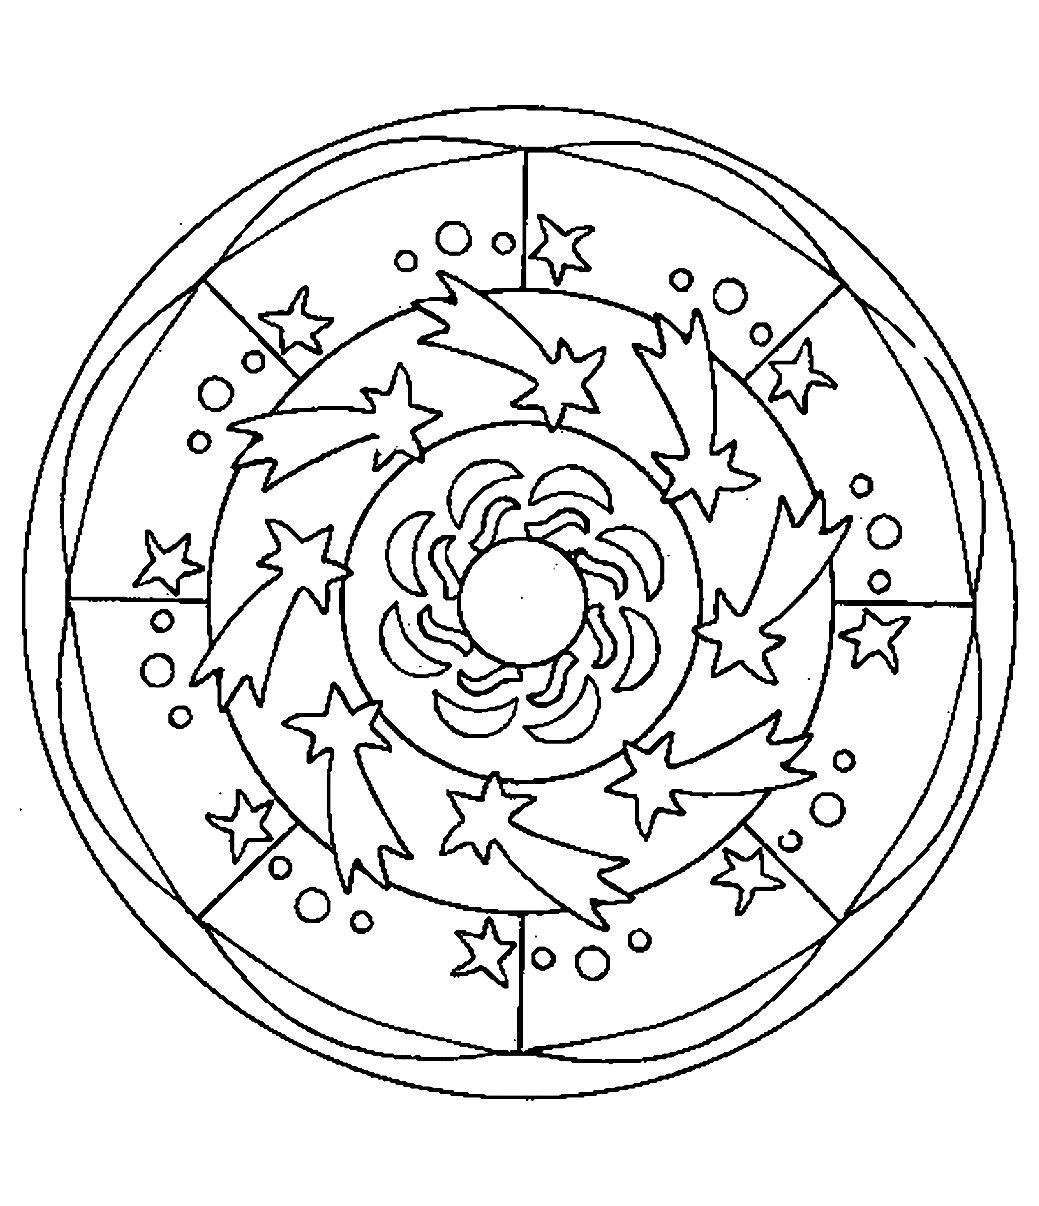 Mandalas faciles pour enfants 100 mandalas zen anti stress mandala a colorier facile - Coloriage mandala facile ...